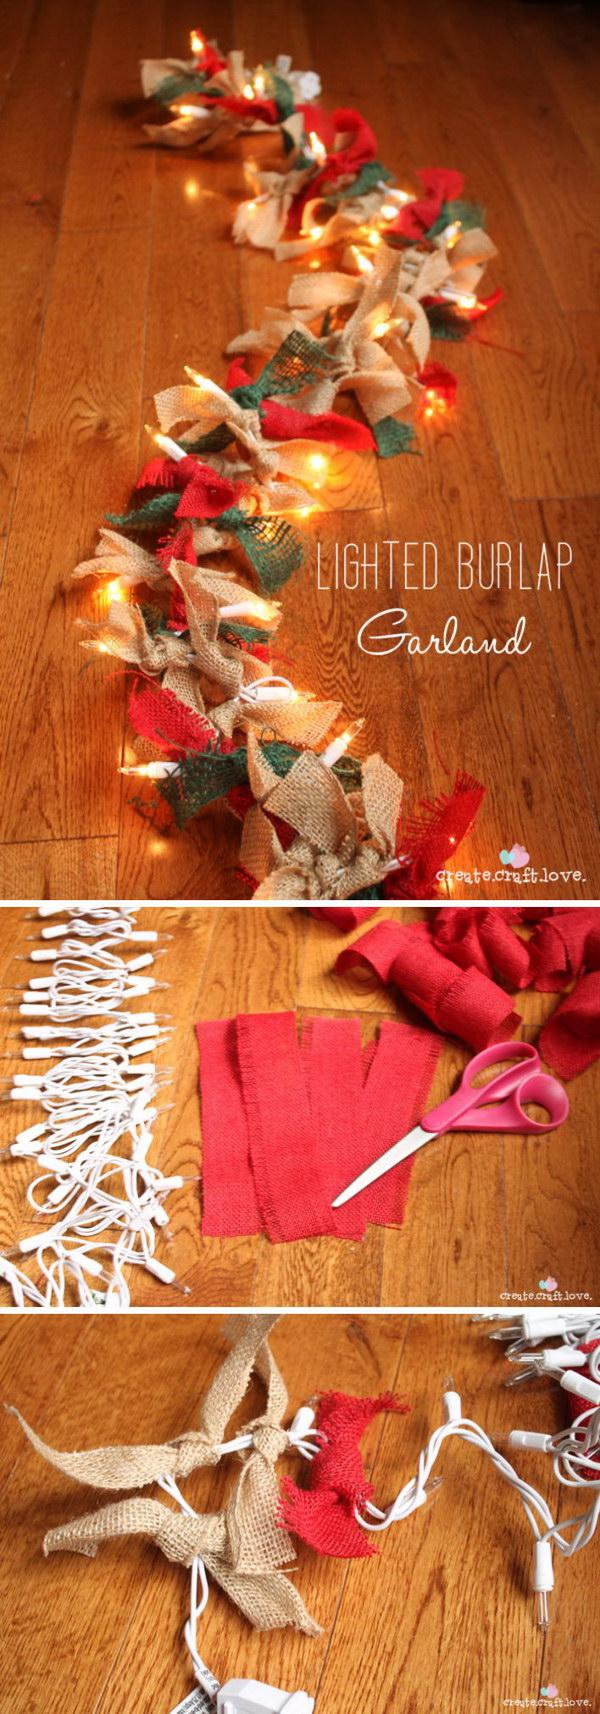 Lighted Burlap Garland.